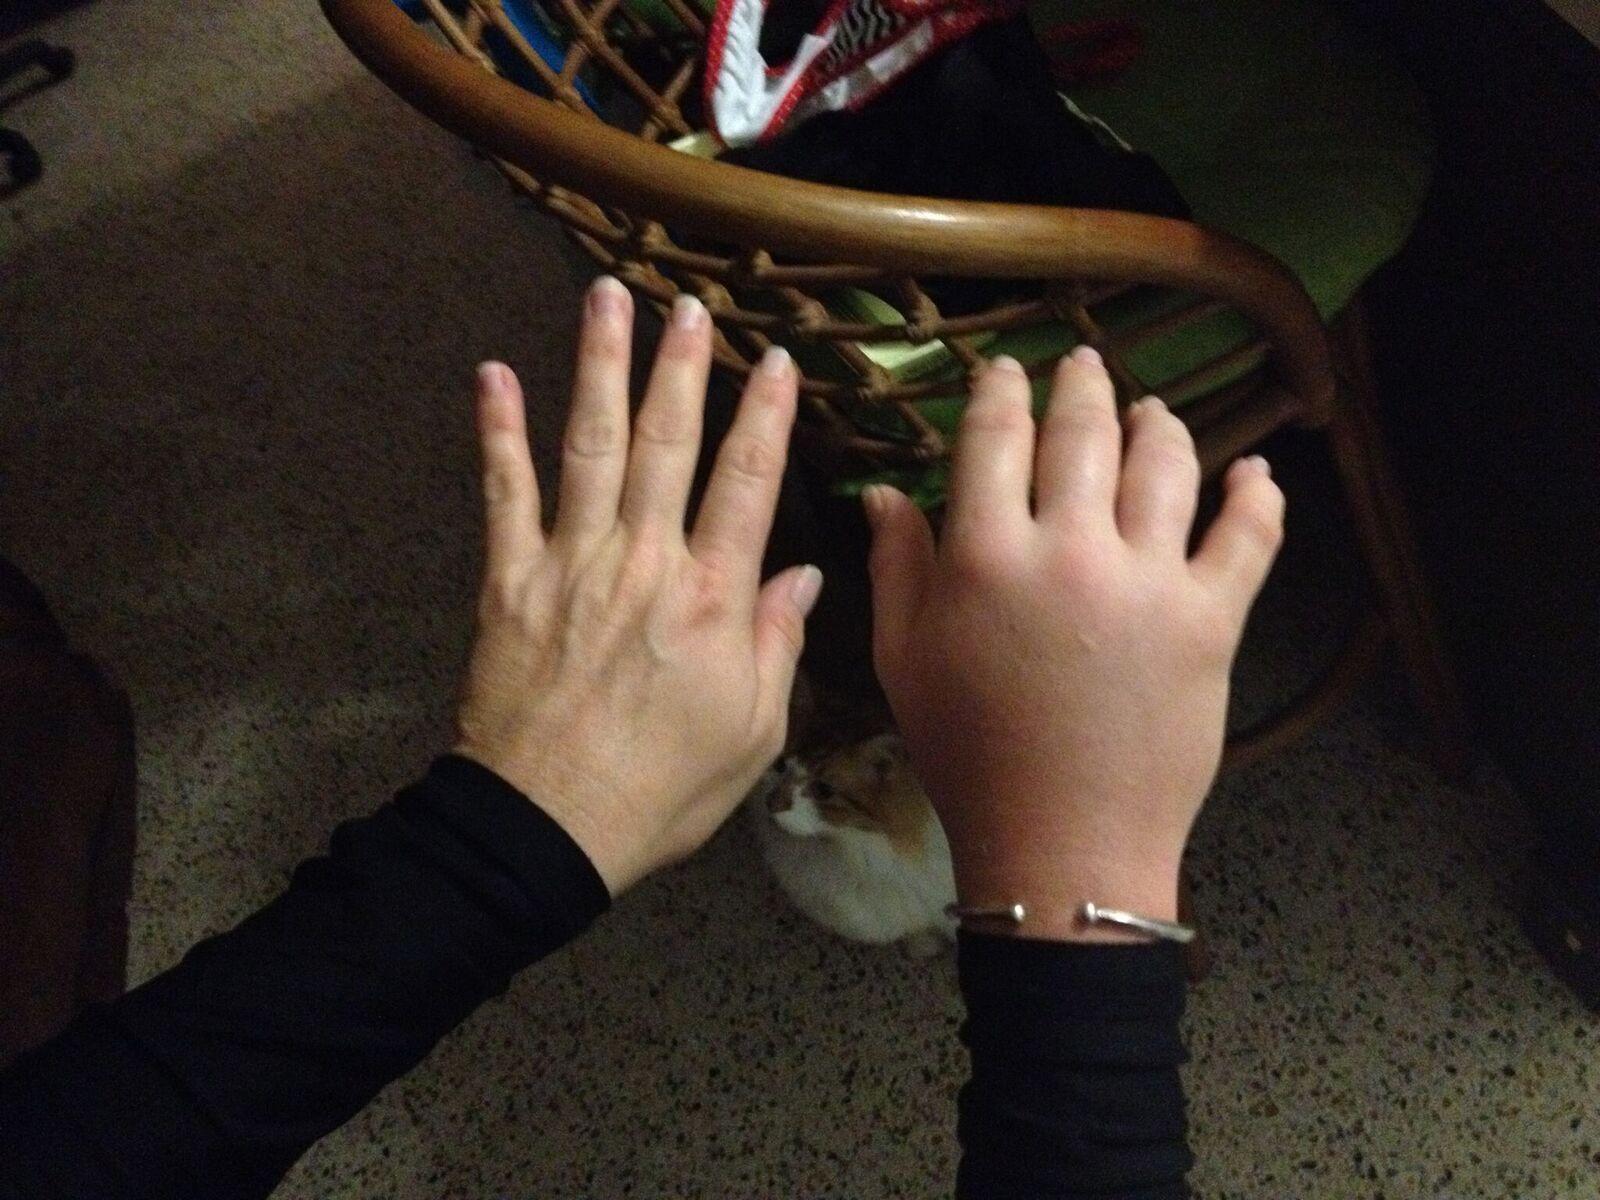 Rachel's hand after being stung.